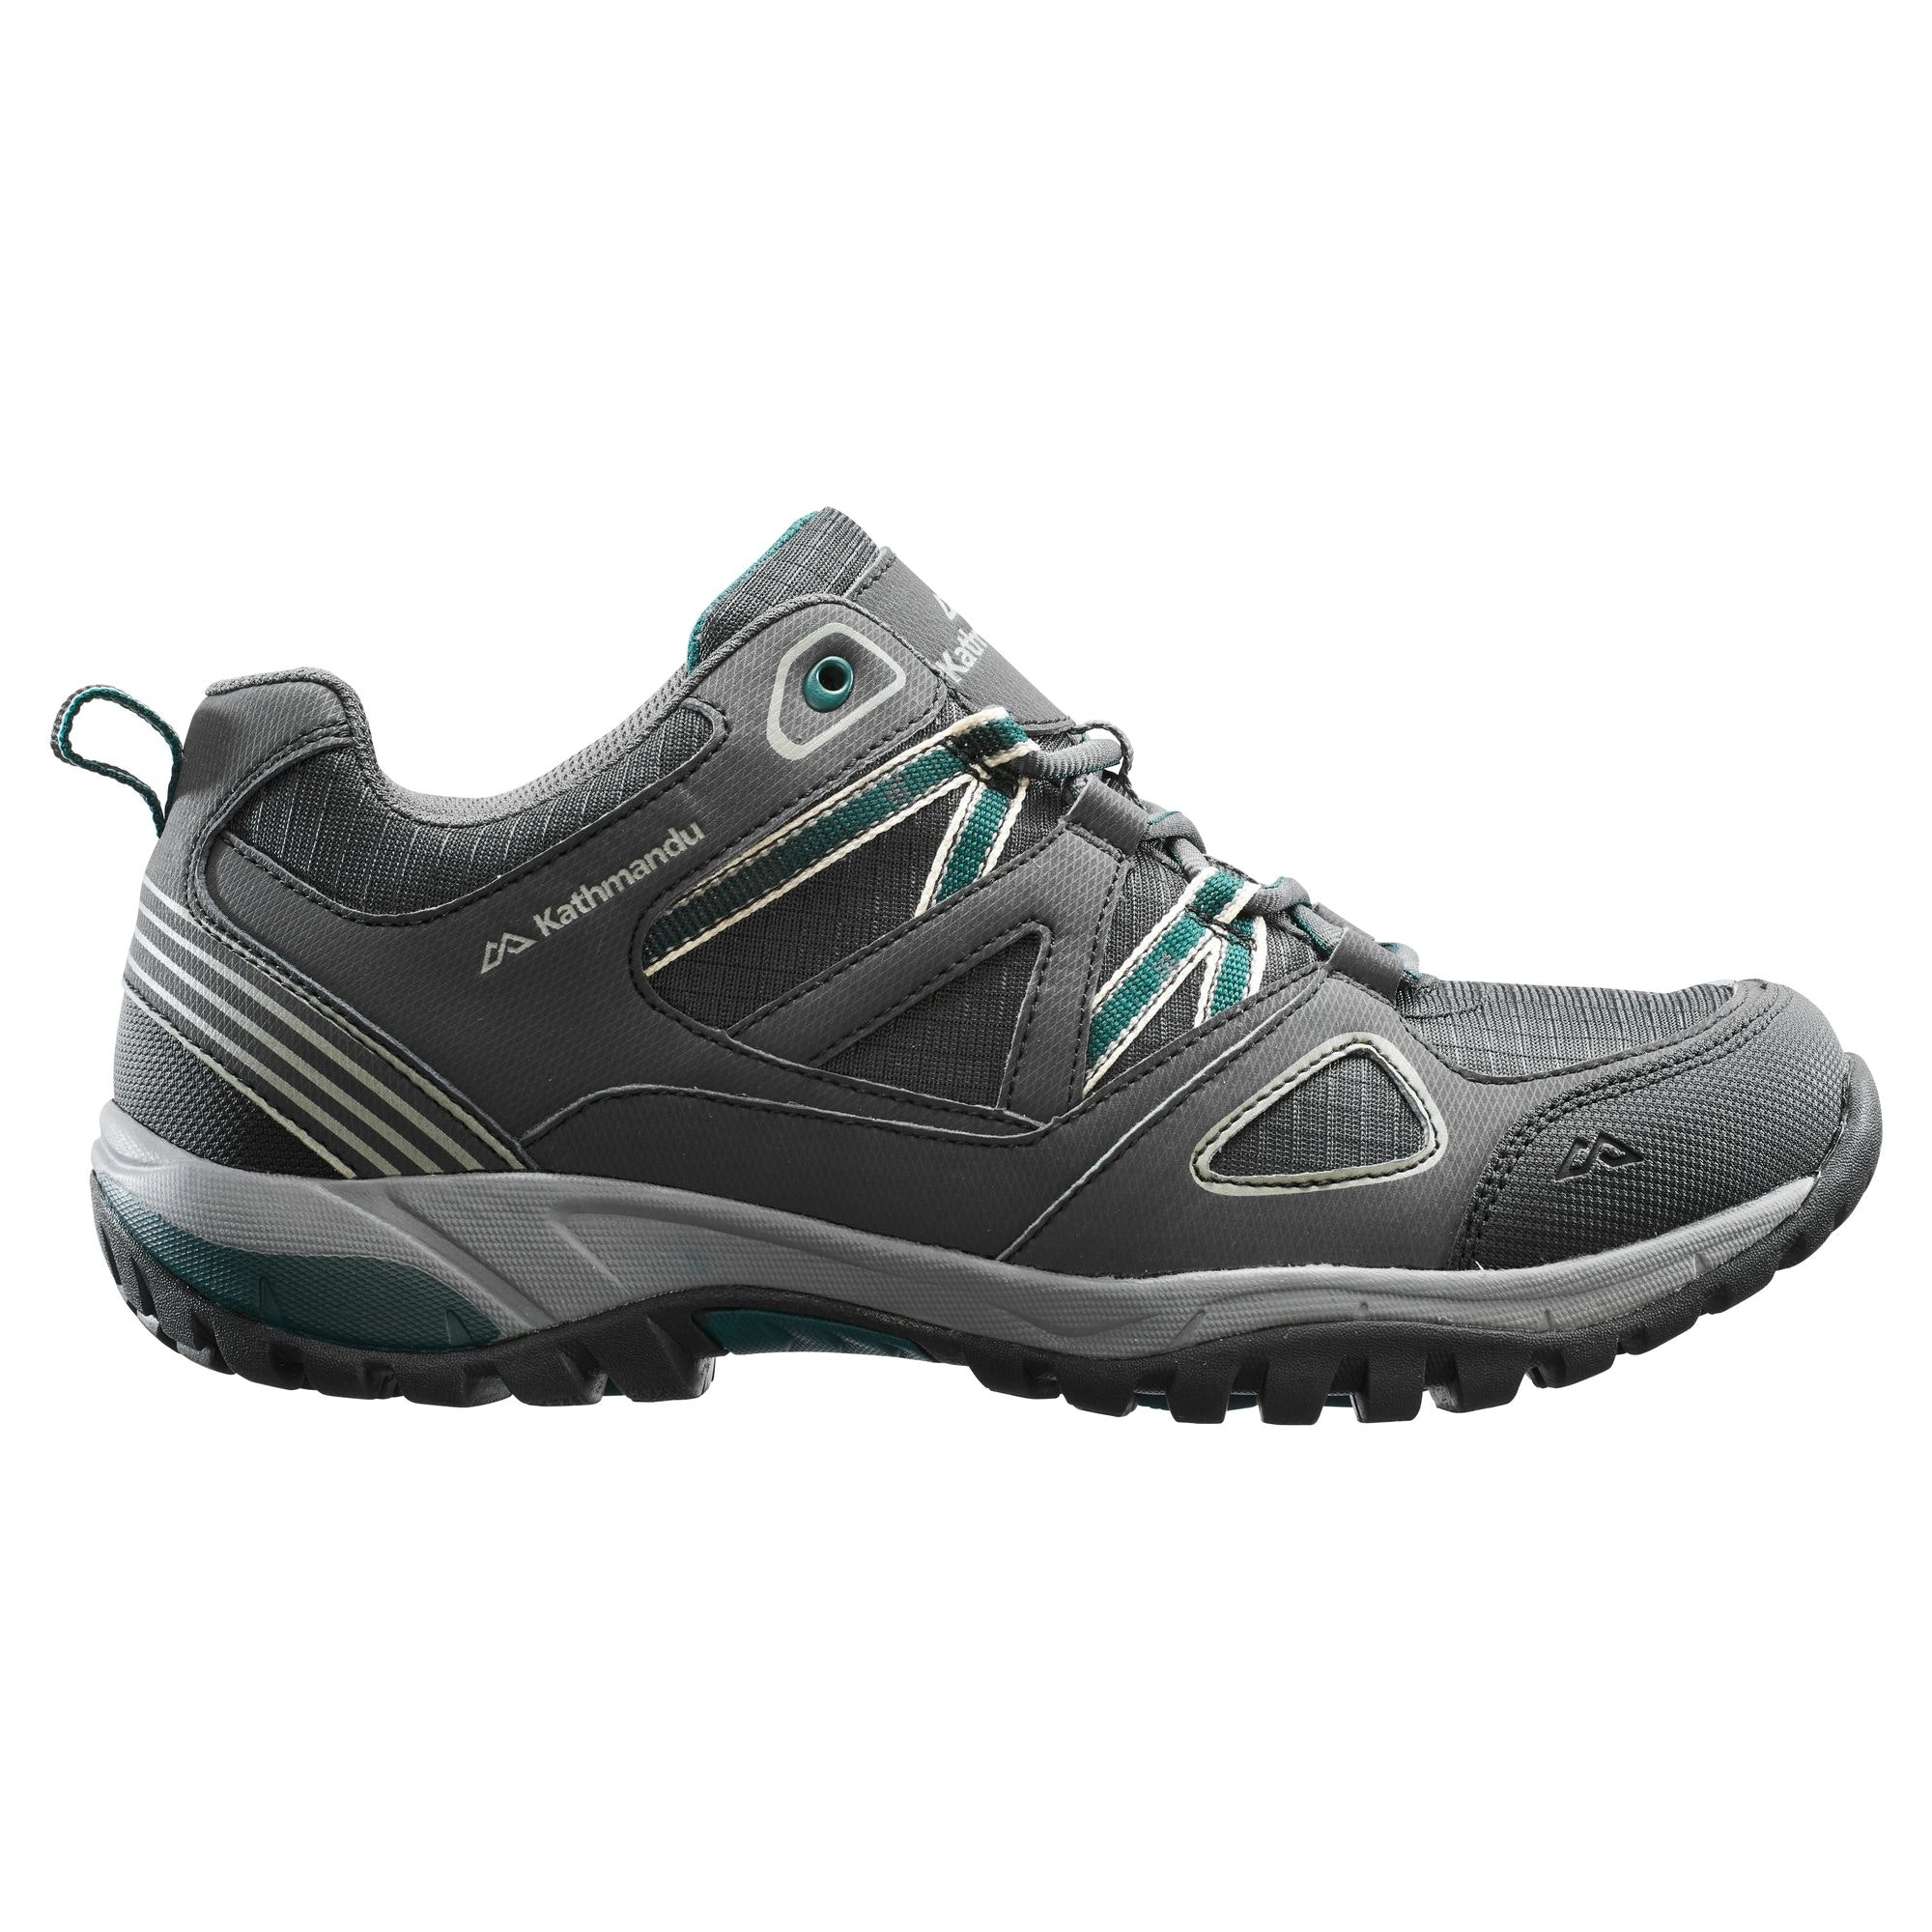 NEW-Kathmandu-Serpentine-II-Men-039-s-Lighweight-Durable-Hiking-Walking-Shoes thumbnail 5